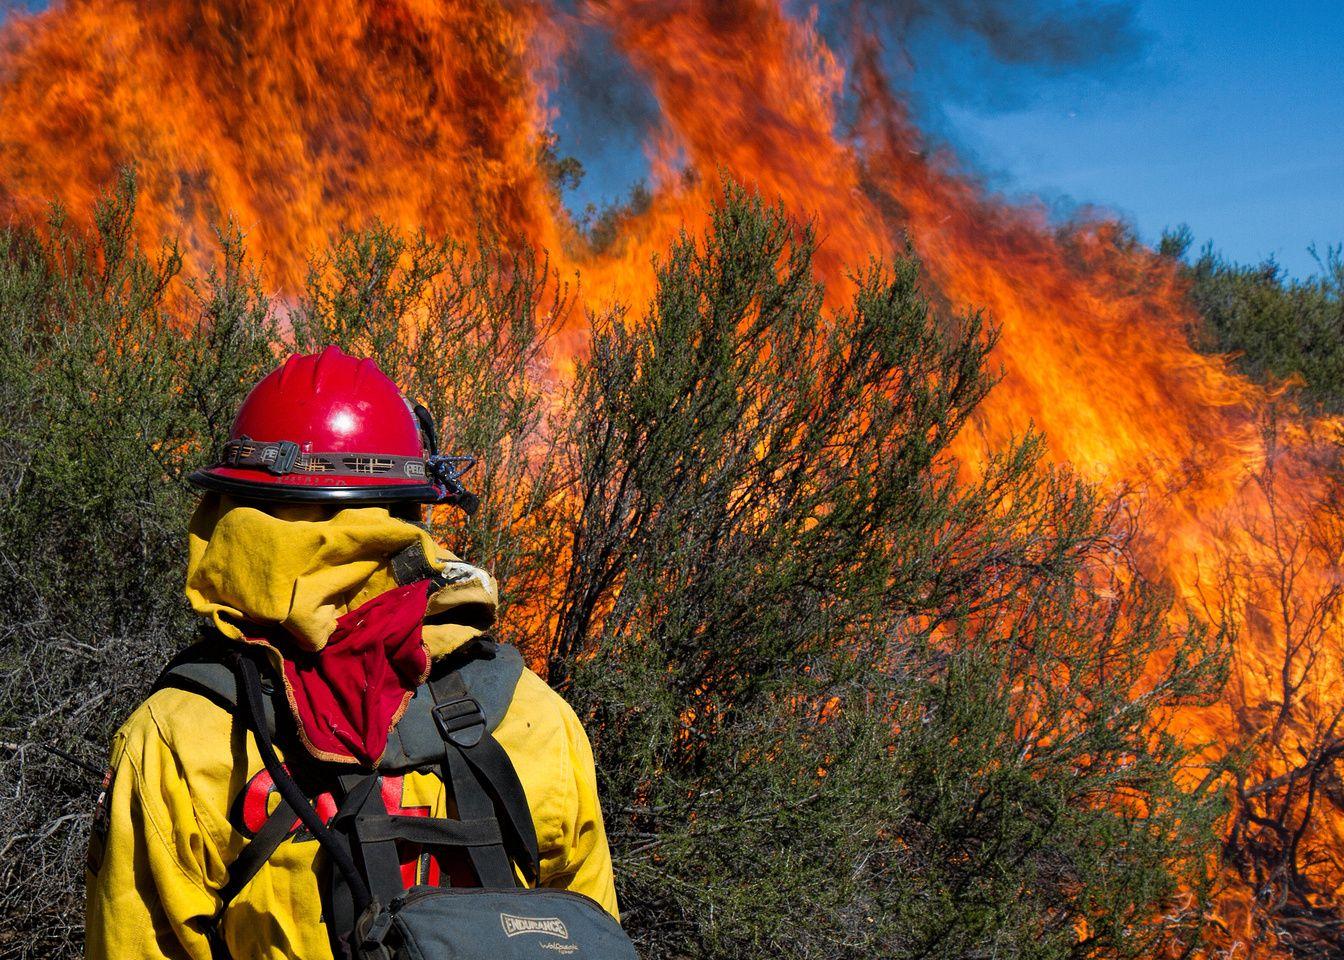 03.19.2014 Isabel Valley Prescribed Burn Wildland